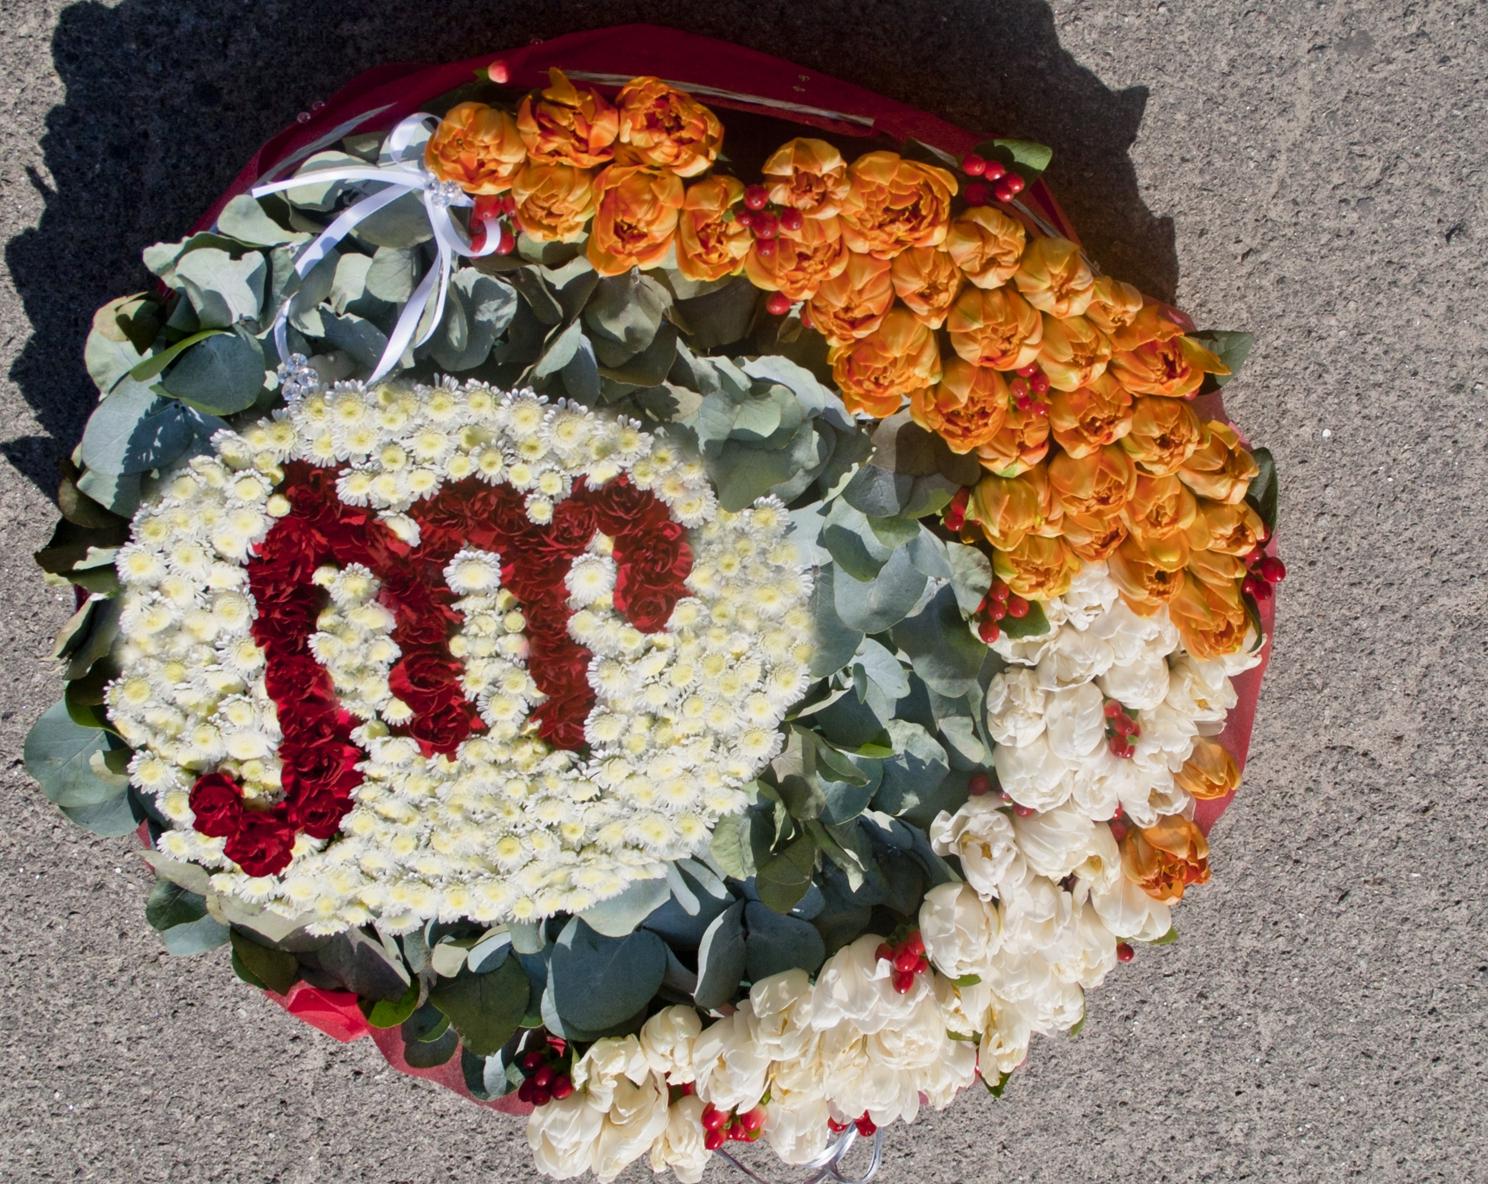 Bouquet Your sign. Scorpio